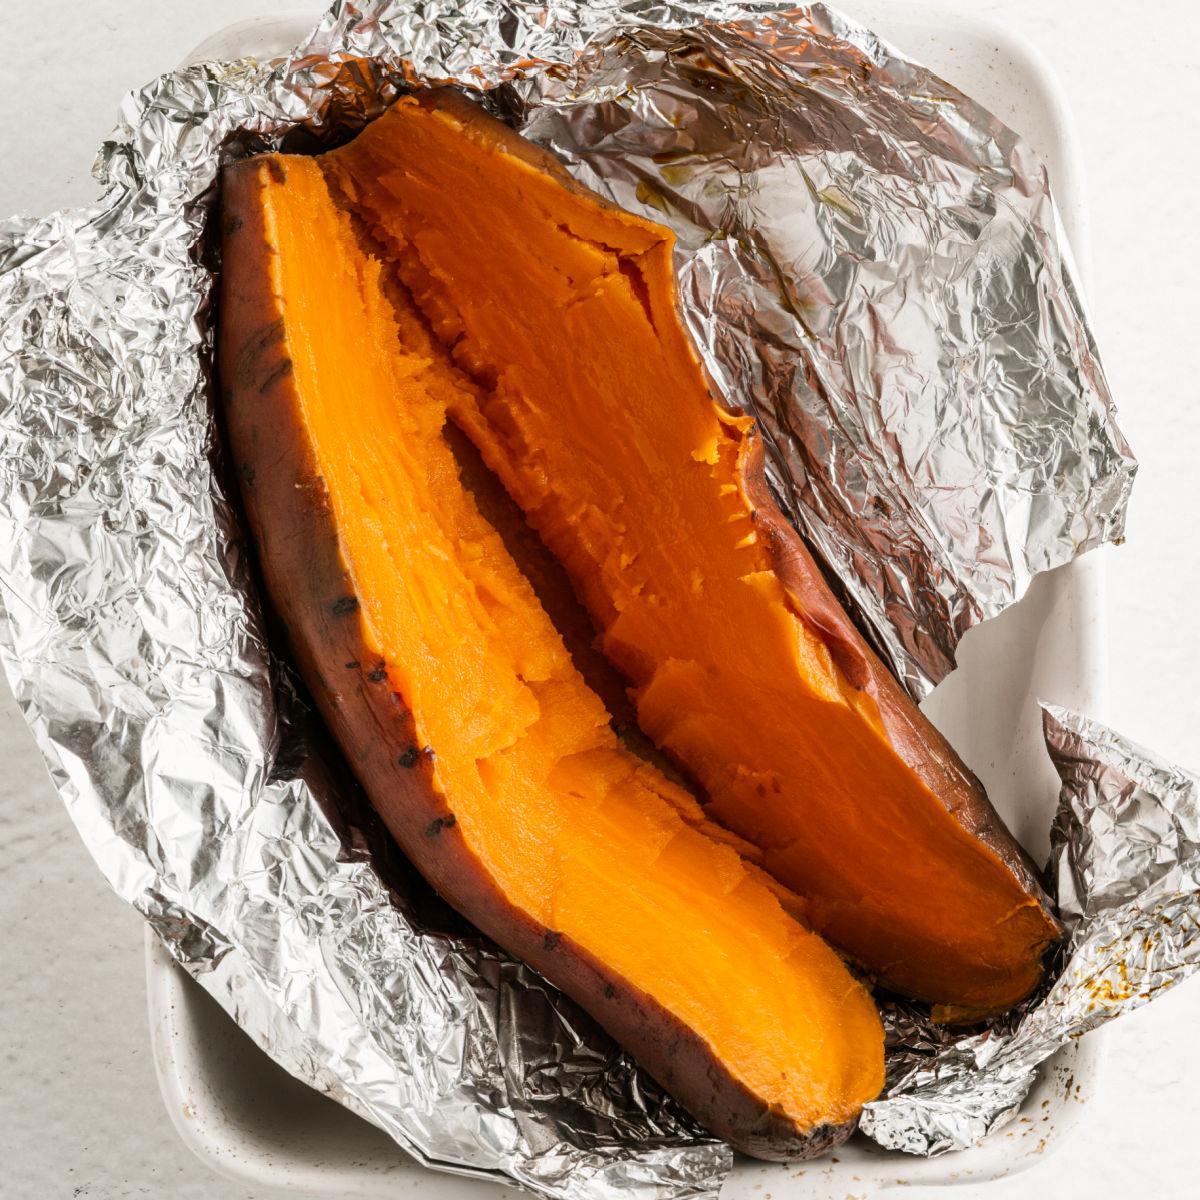 Sweet potato baked in foil.